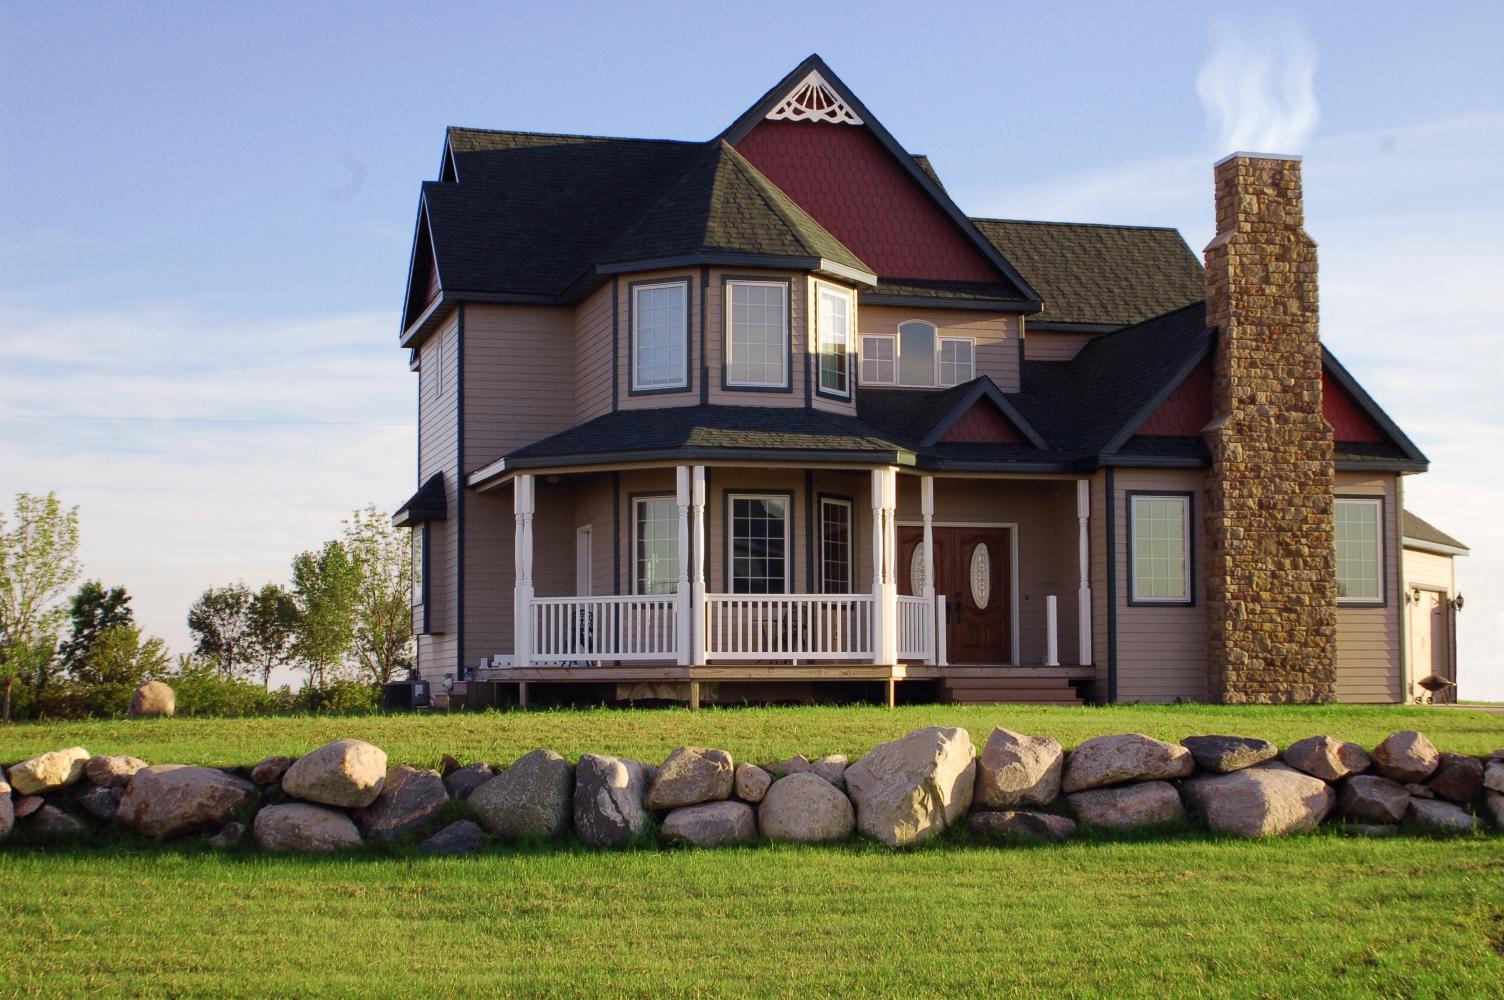 Dwelling-Fire-Insurance